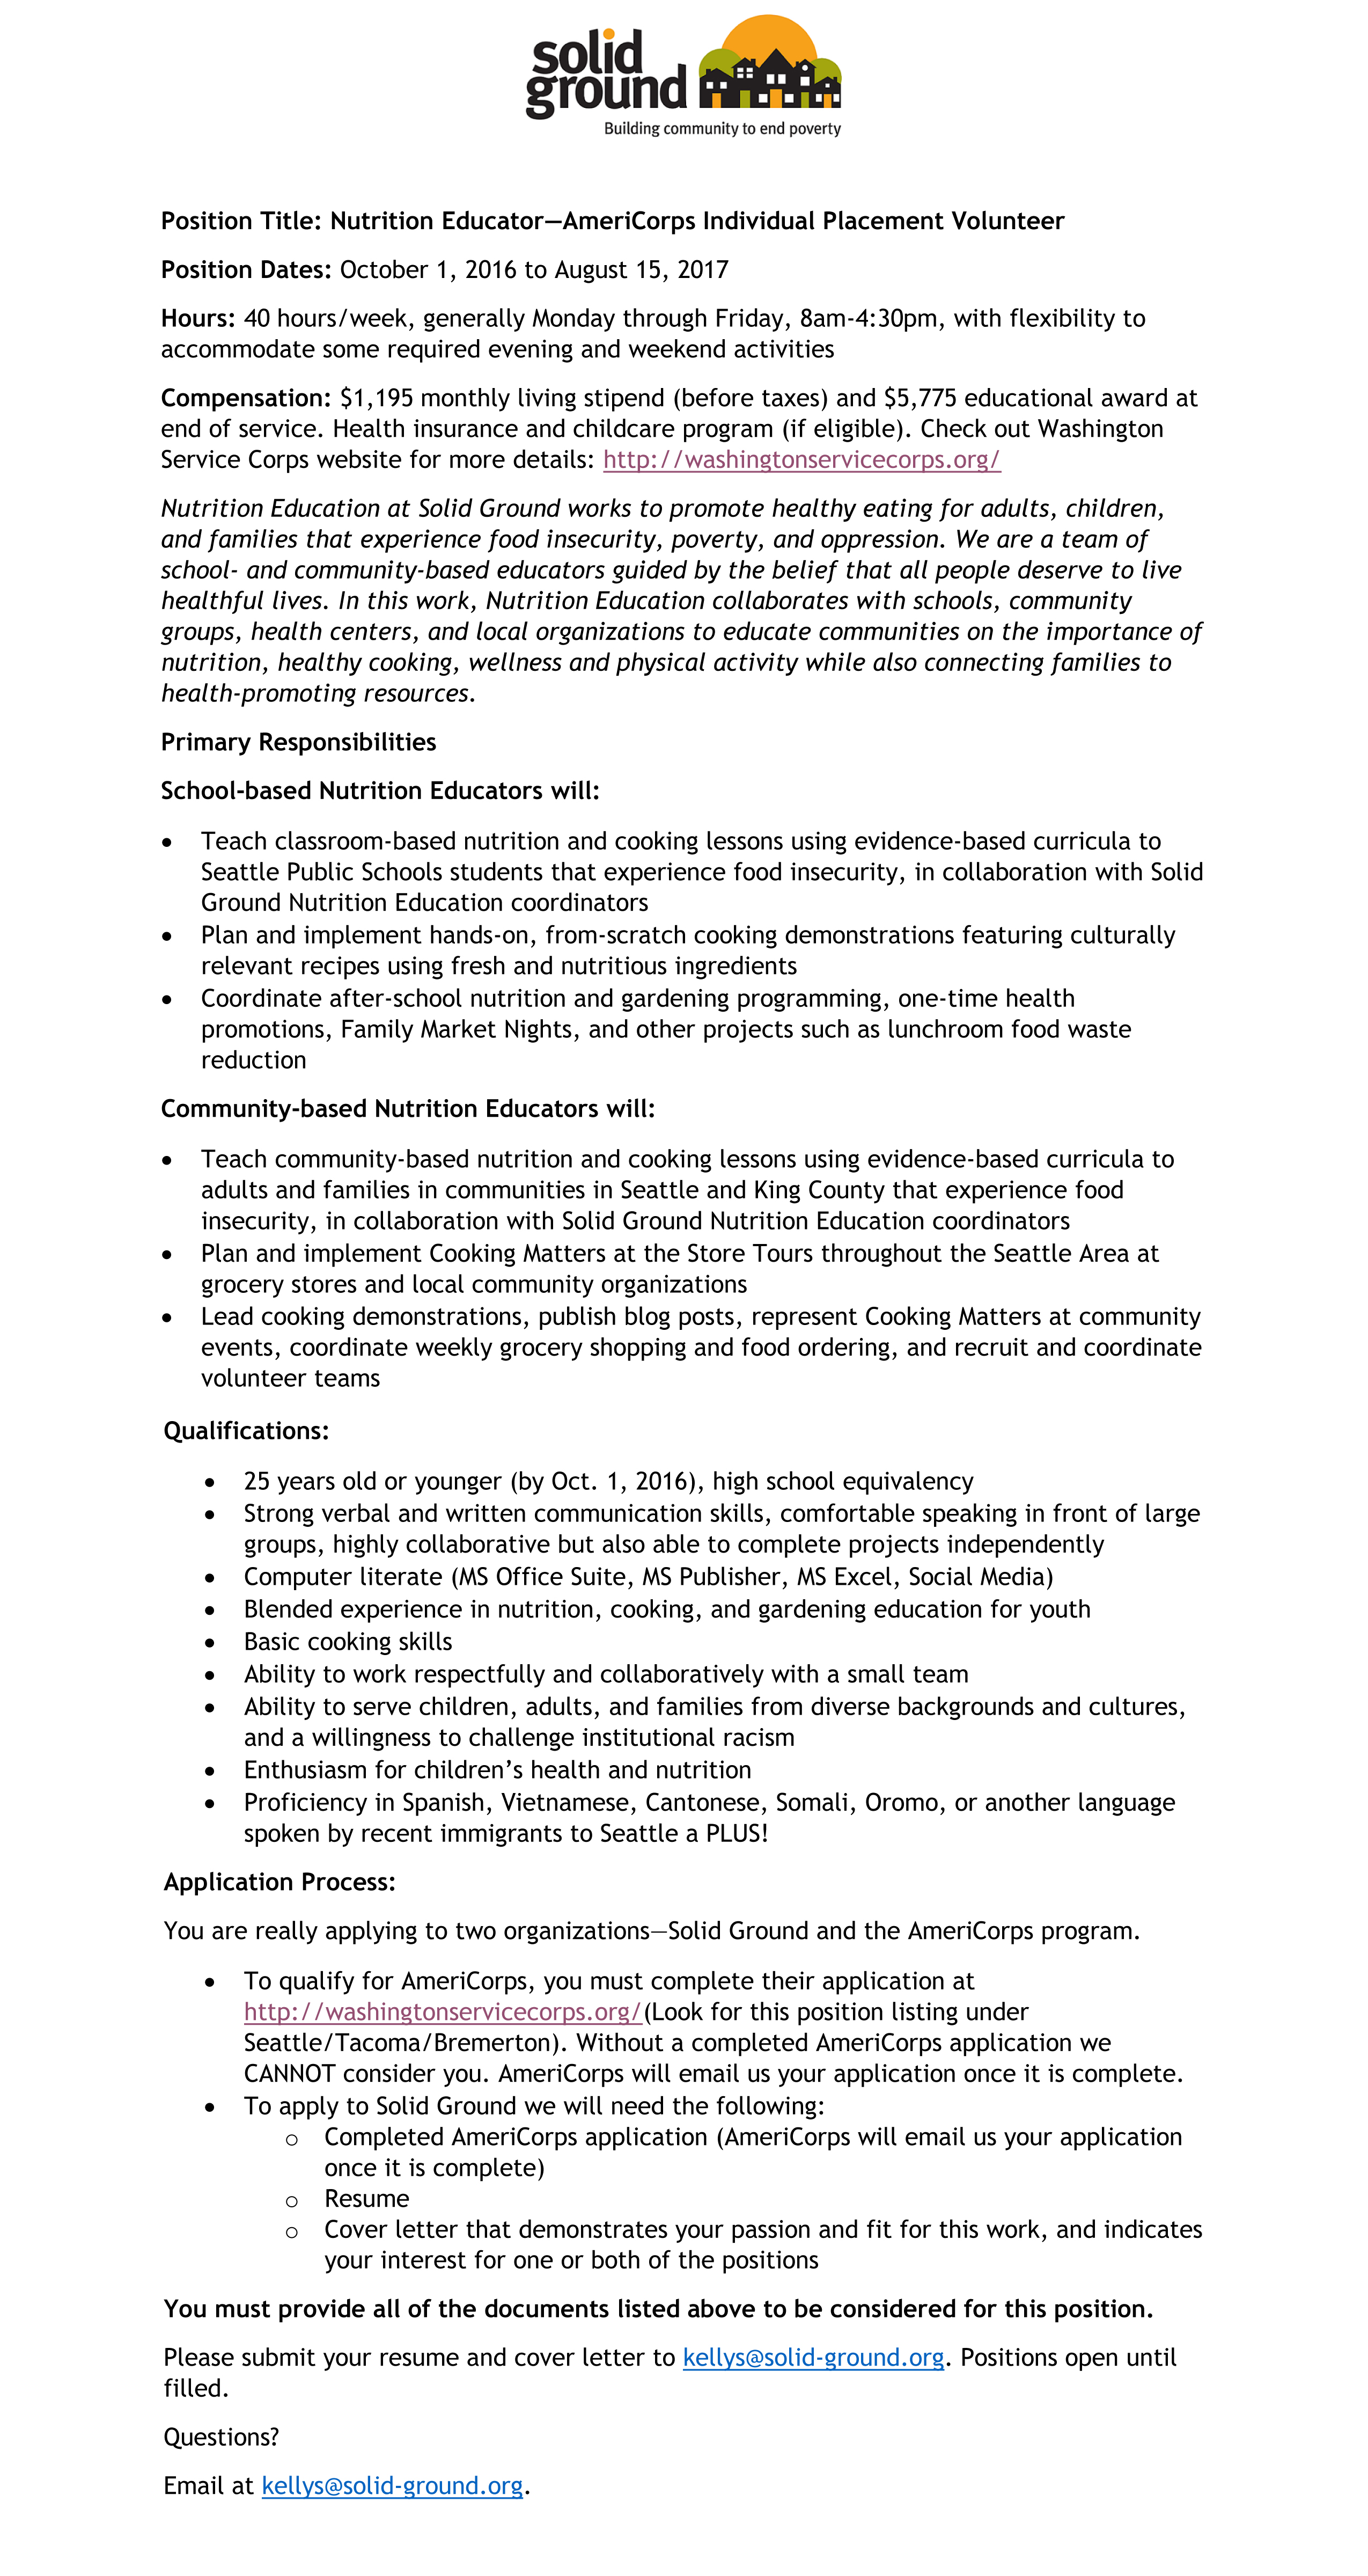 AmeriCorps Nutrition Educator 062016